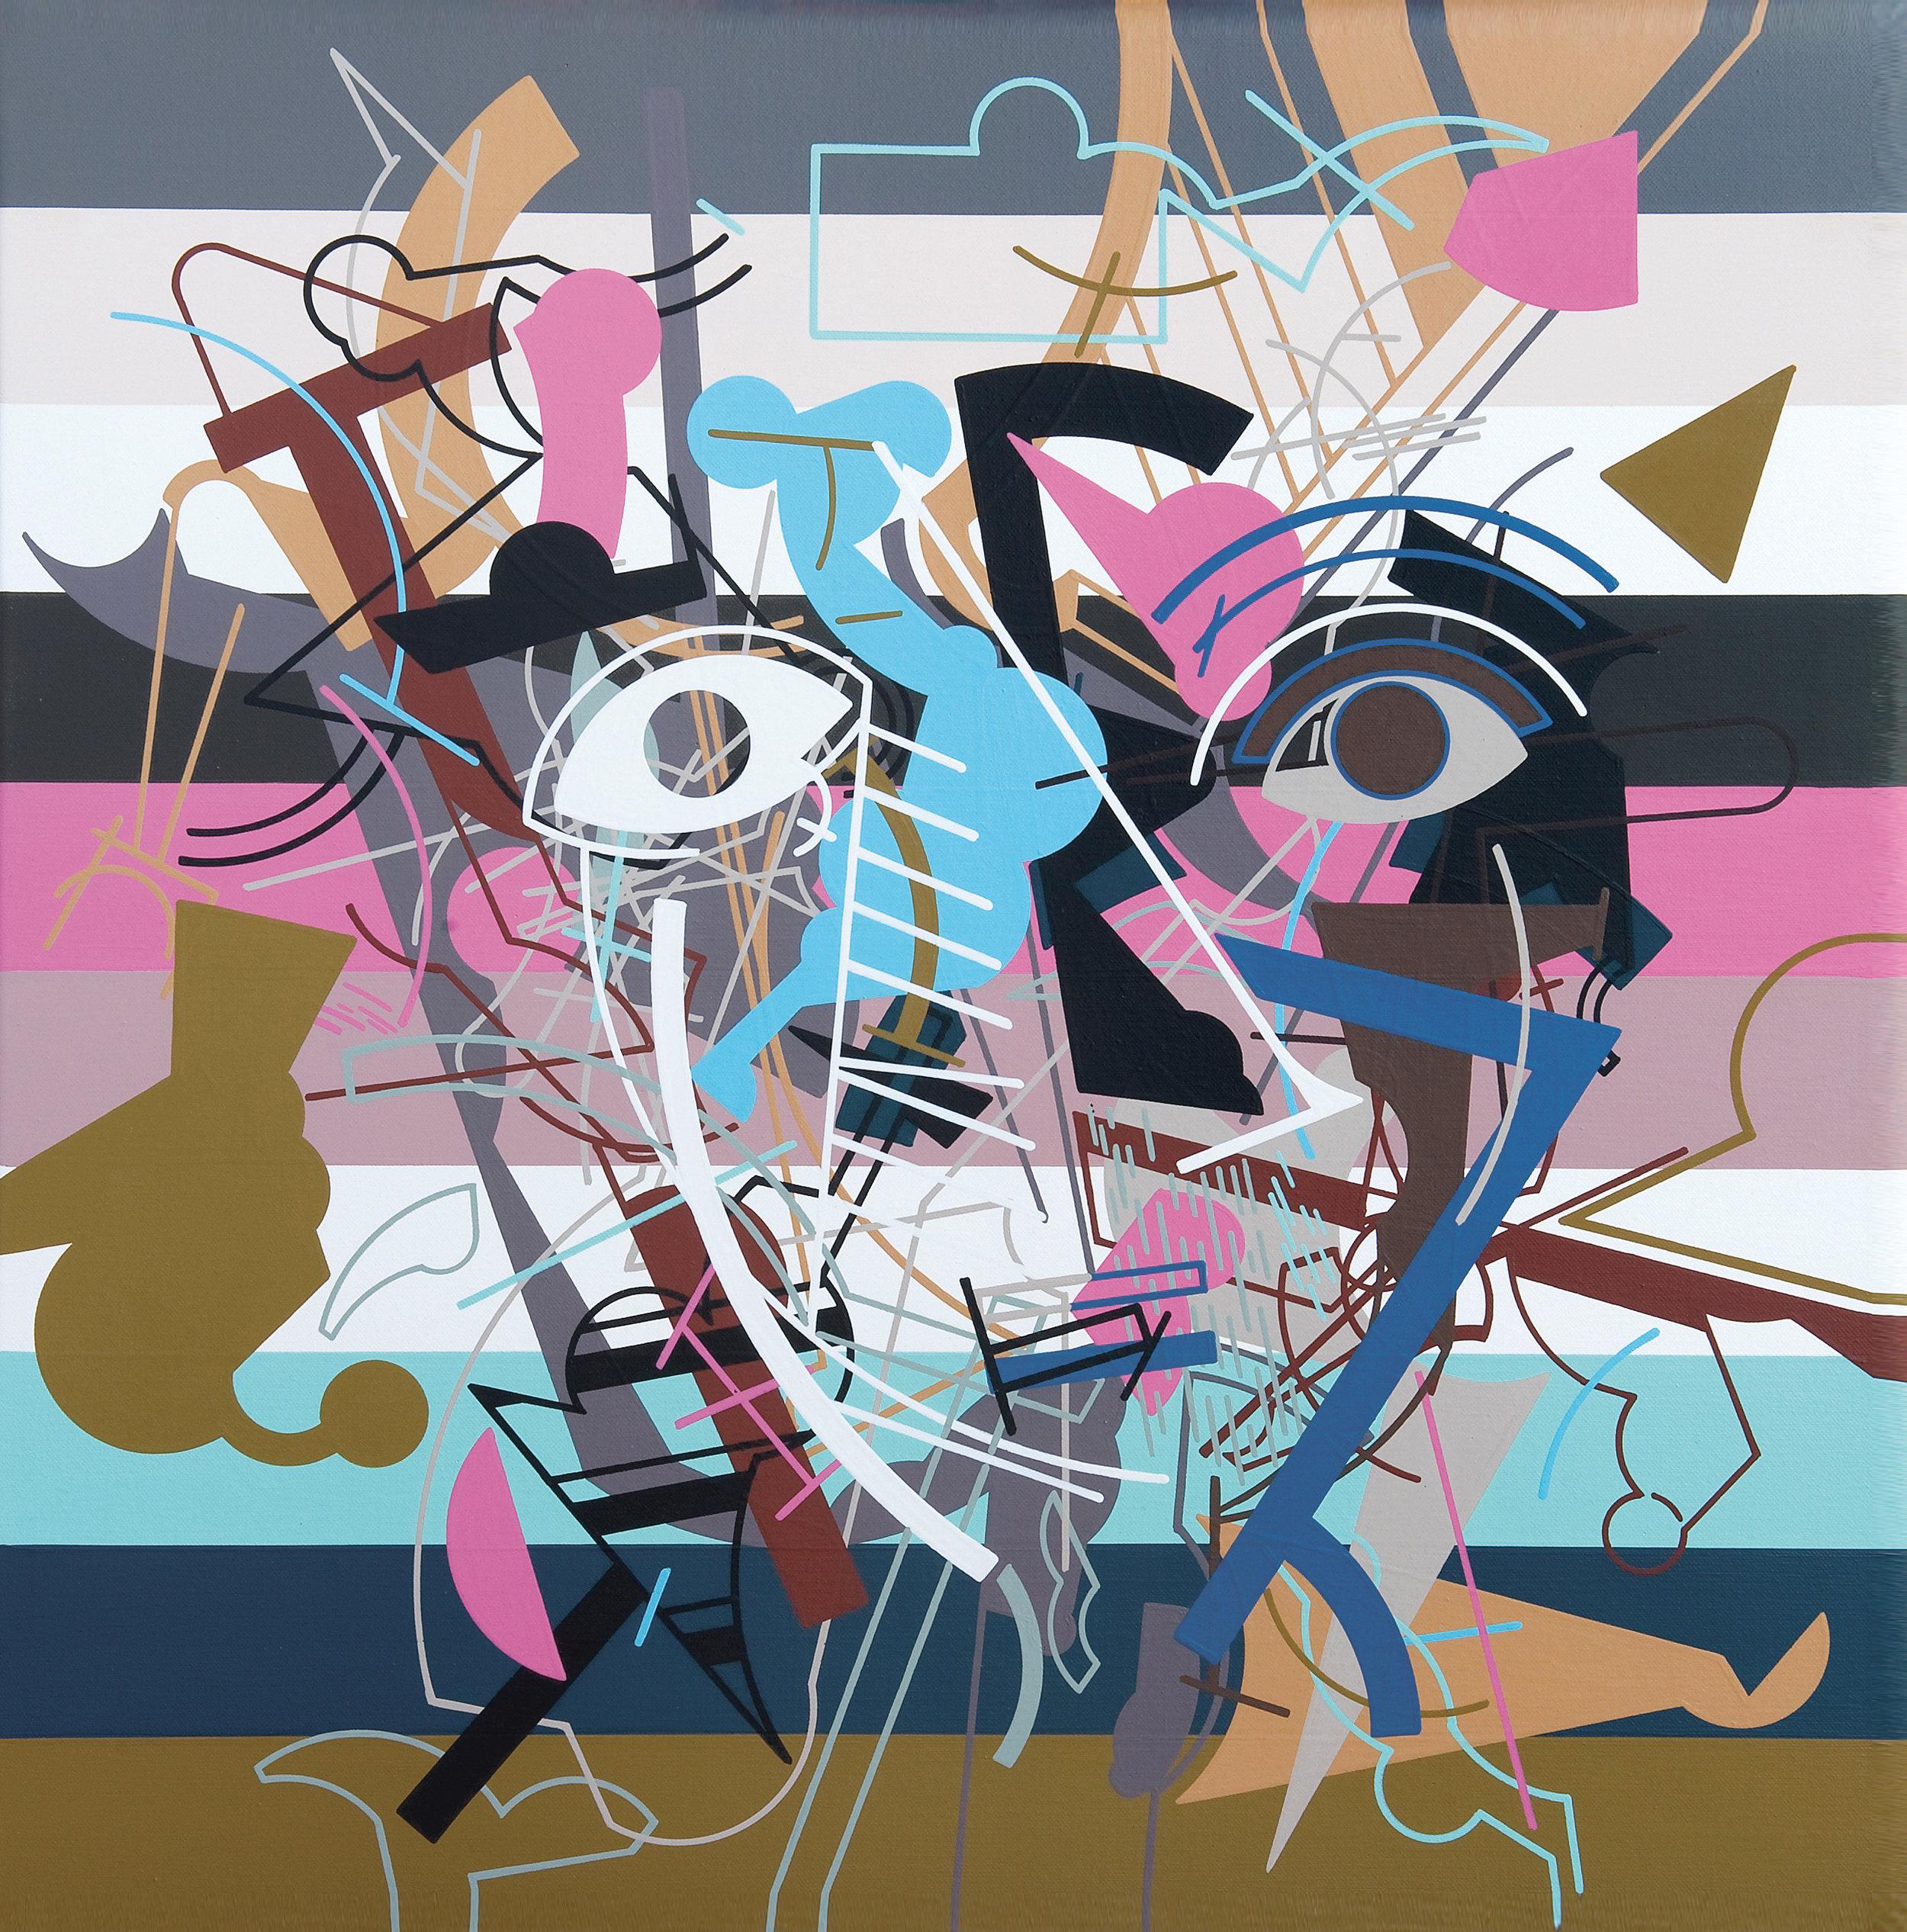 Head 1, 2014, Acrylic on Canvas, 25.6 x 25.6 in (65 x 65 cm)